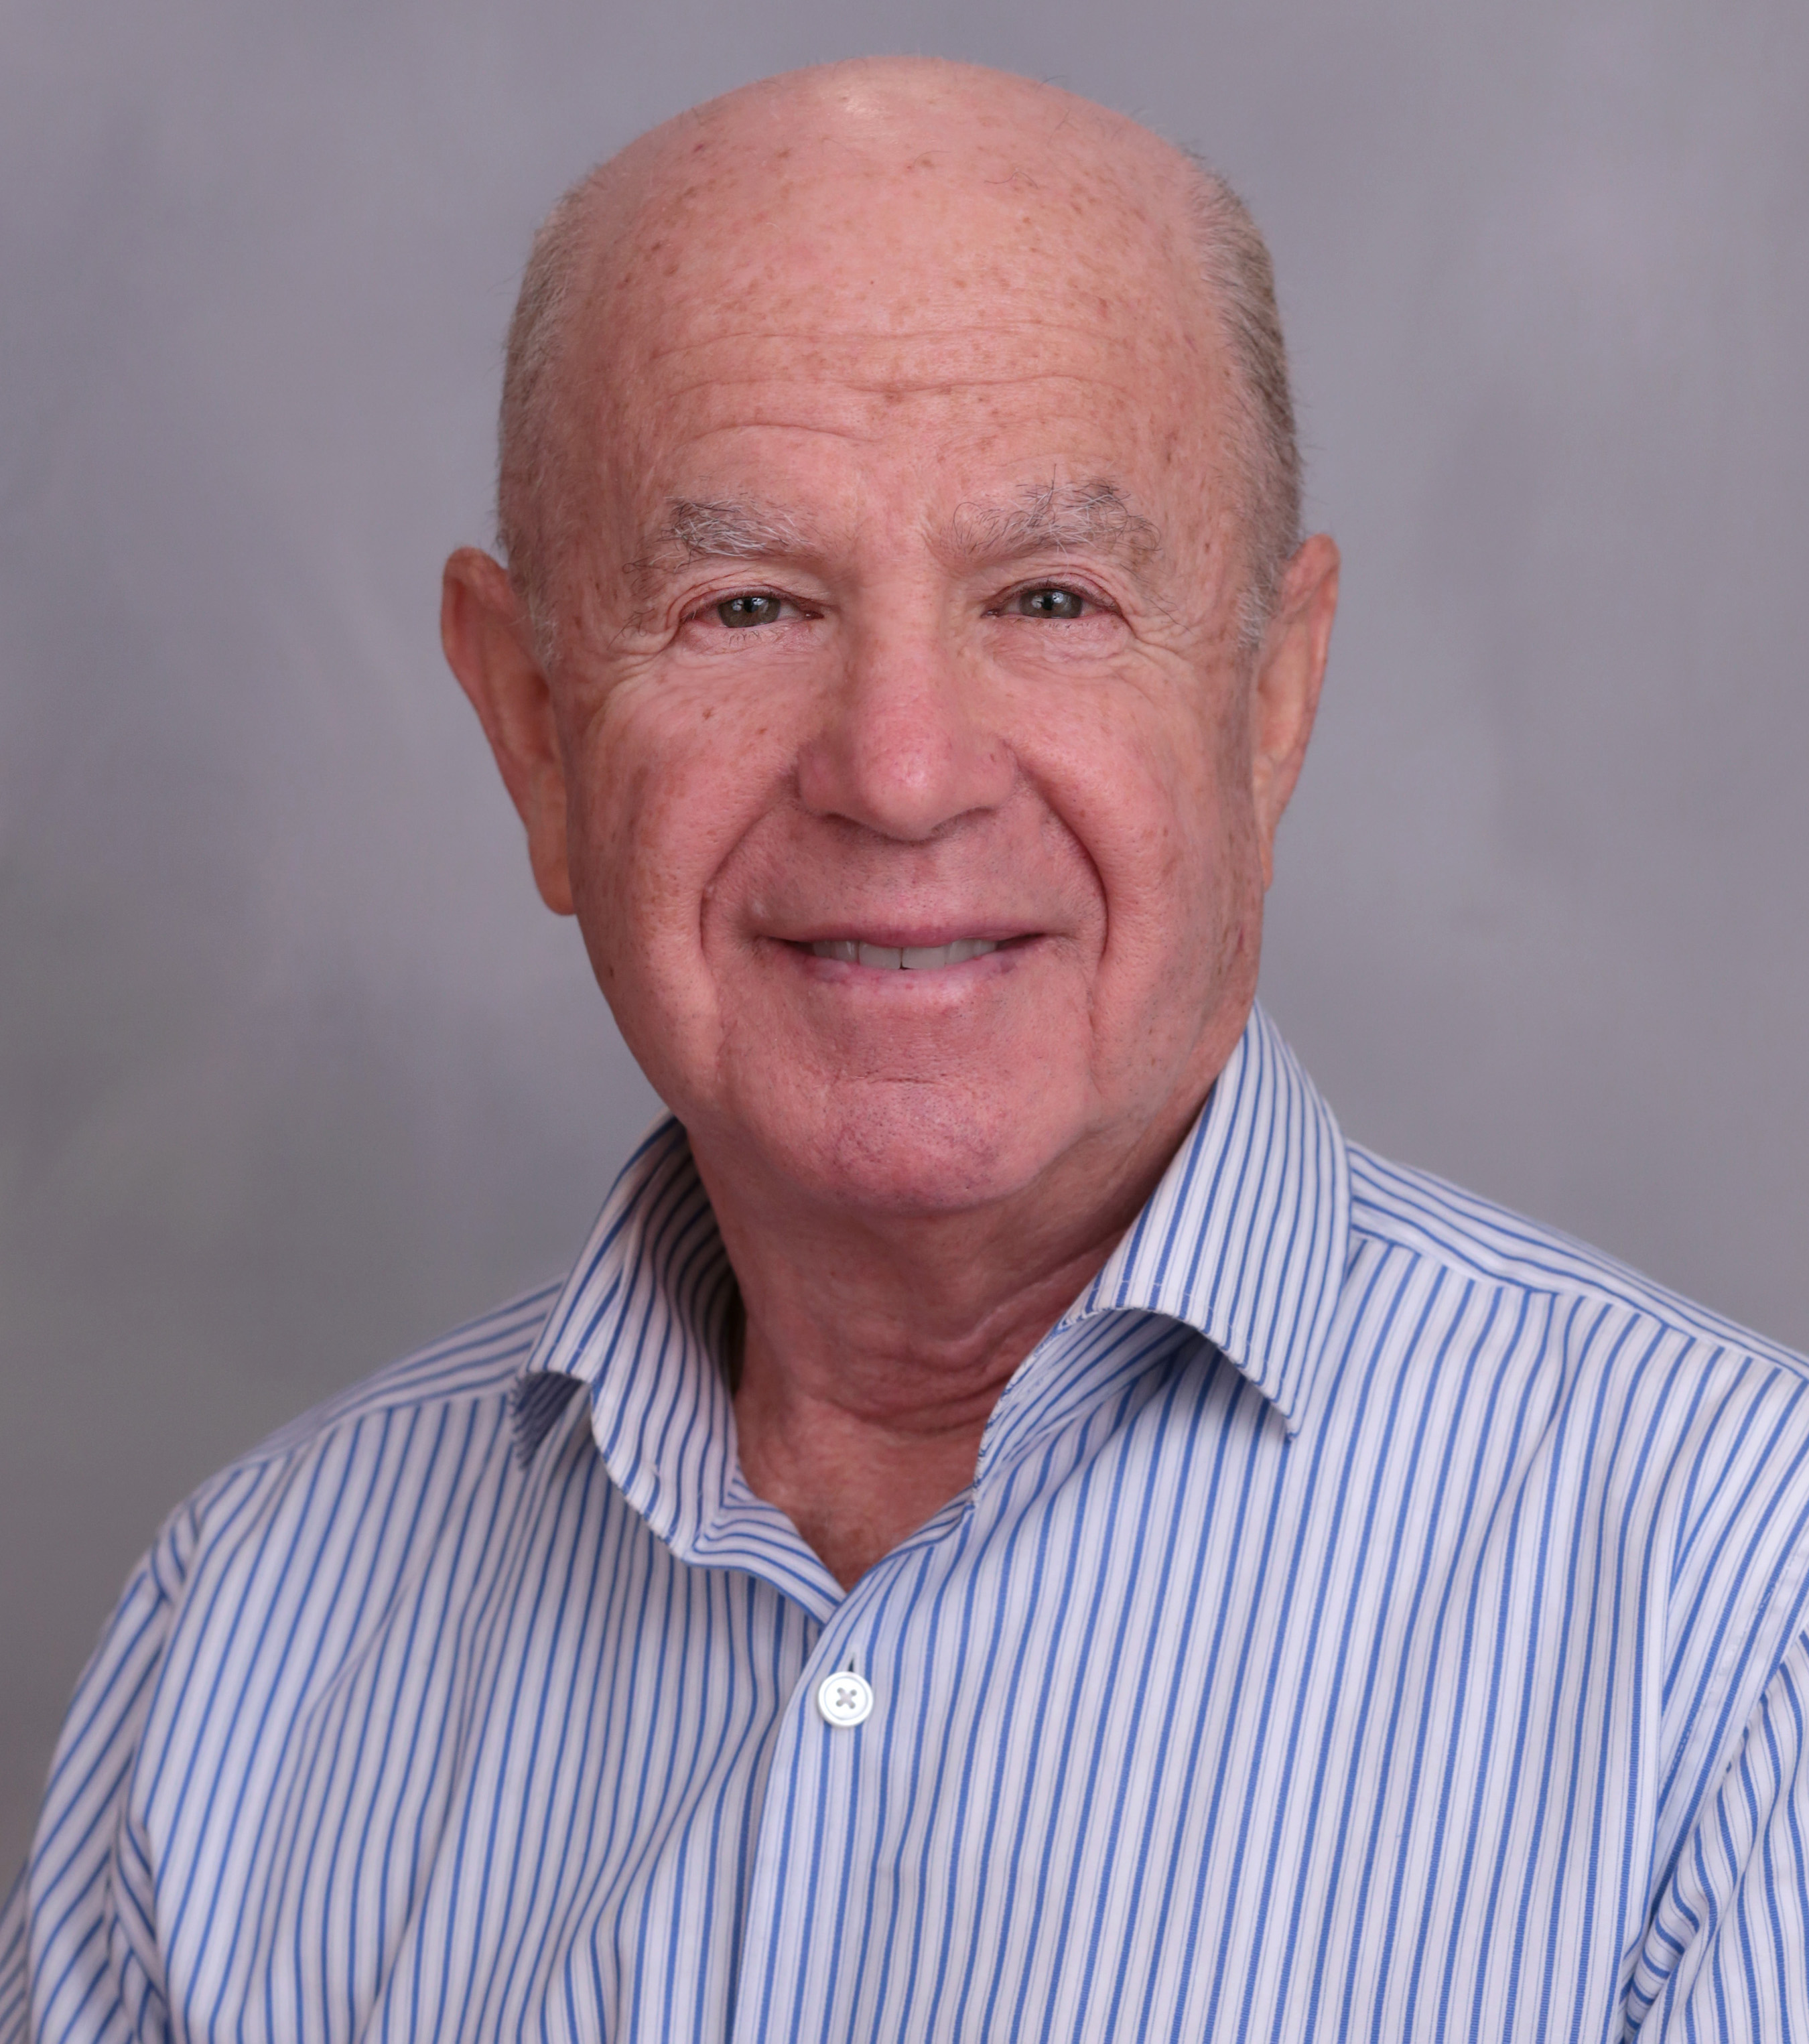 Edward Altman